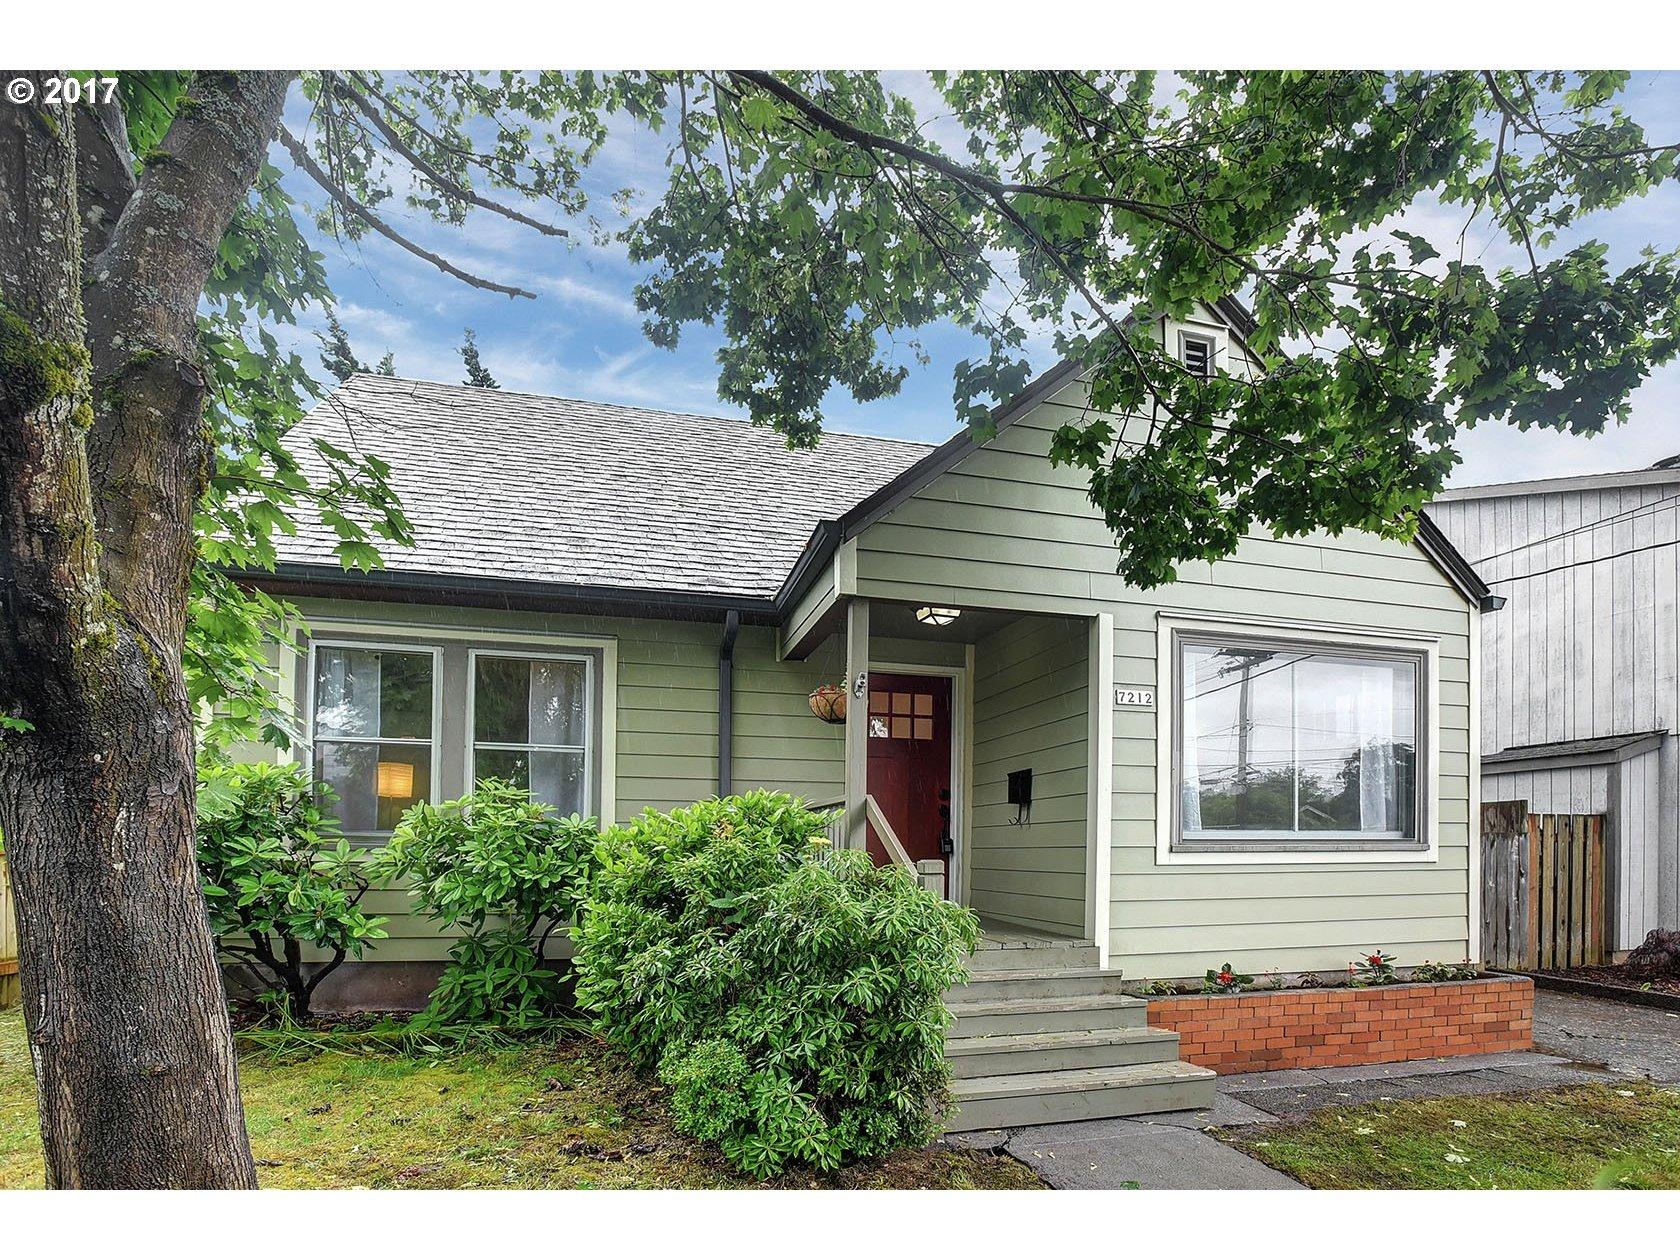 7212 N CENTRAL ST, Portland, OR 97203